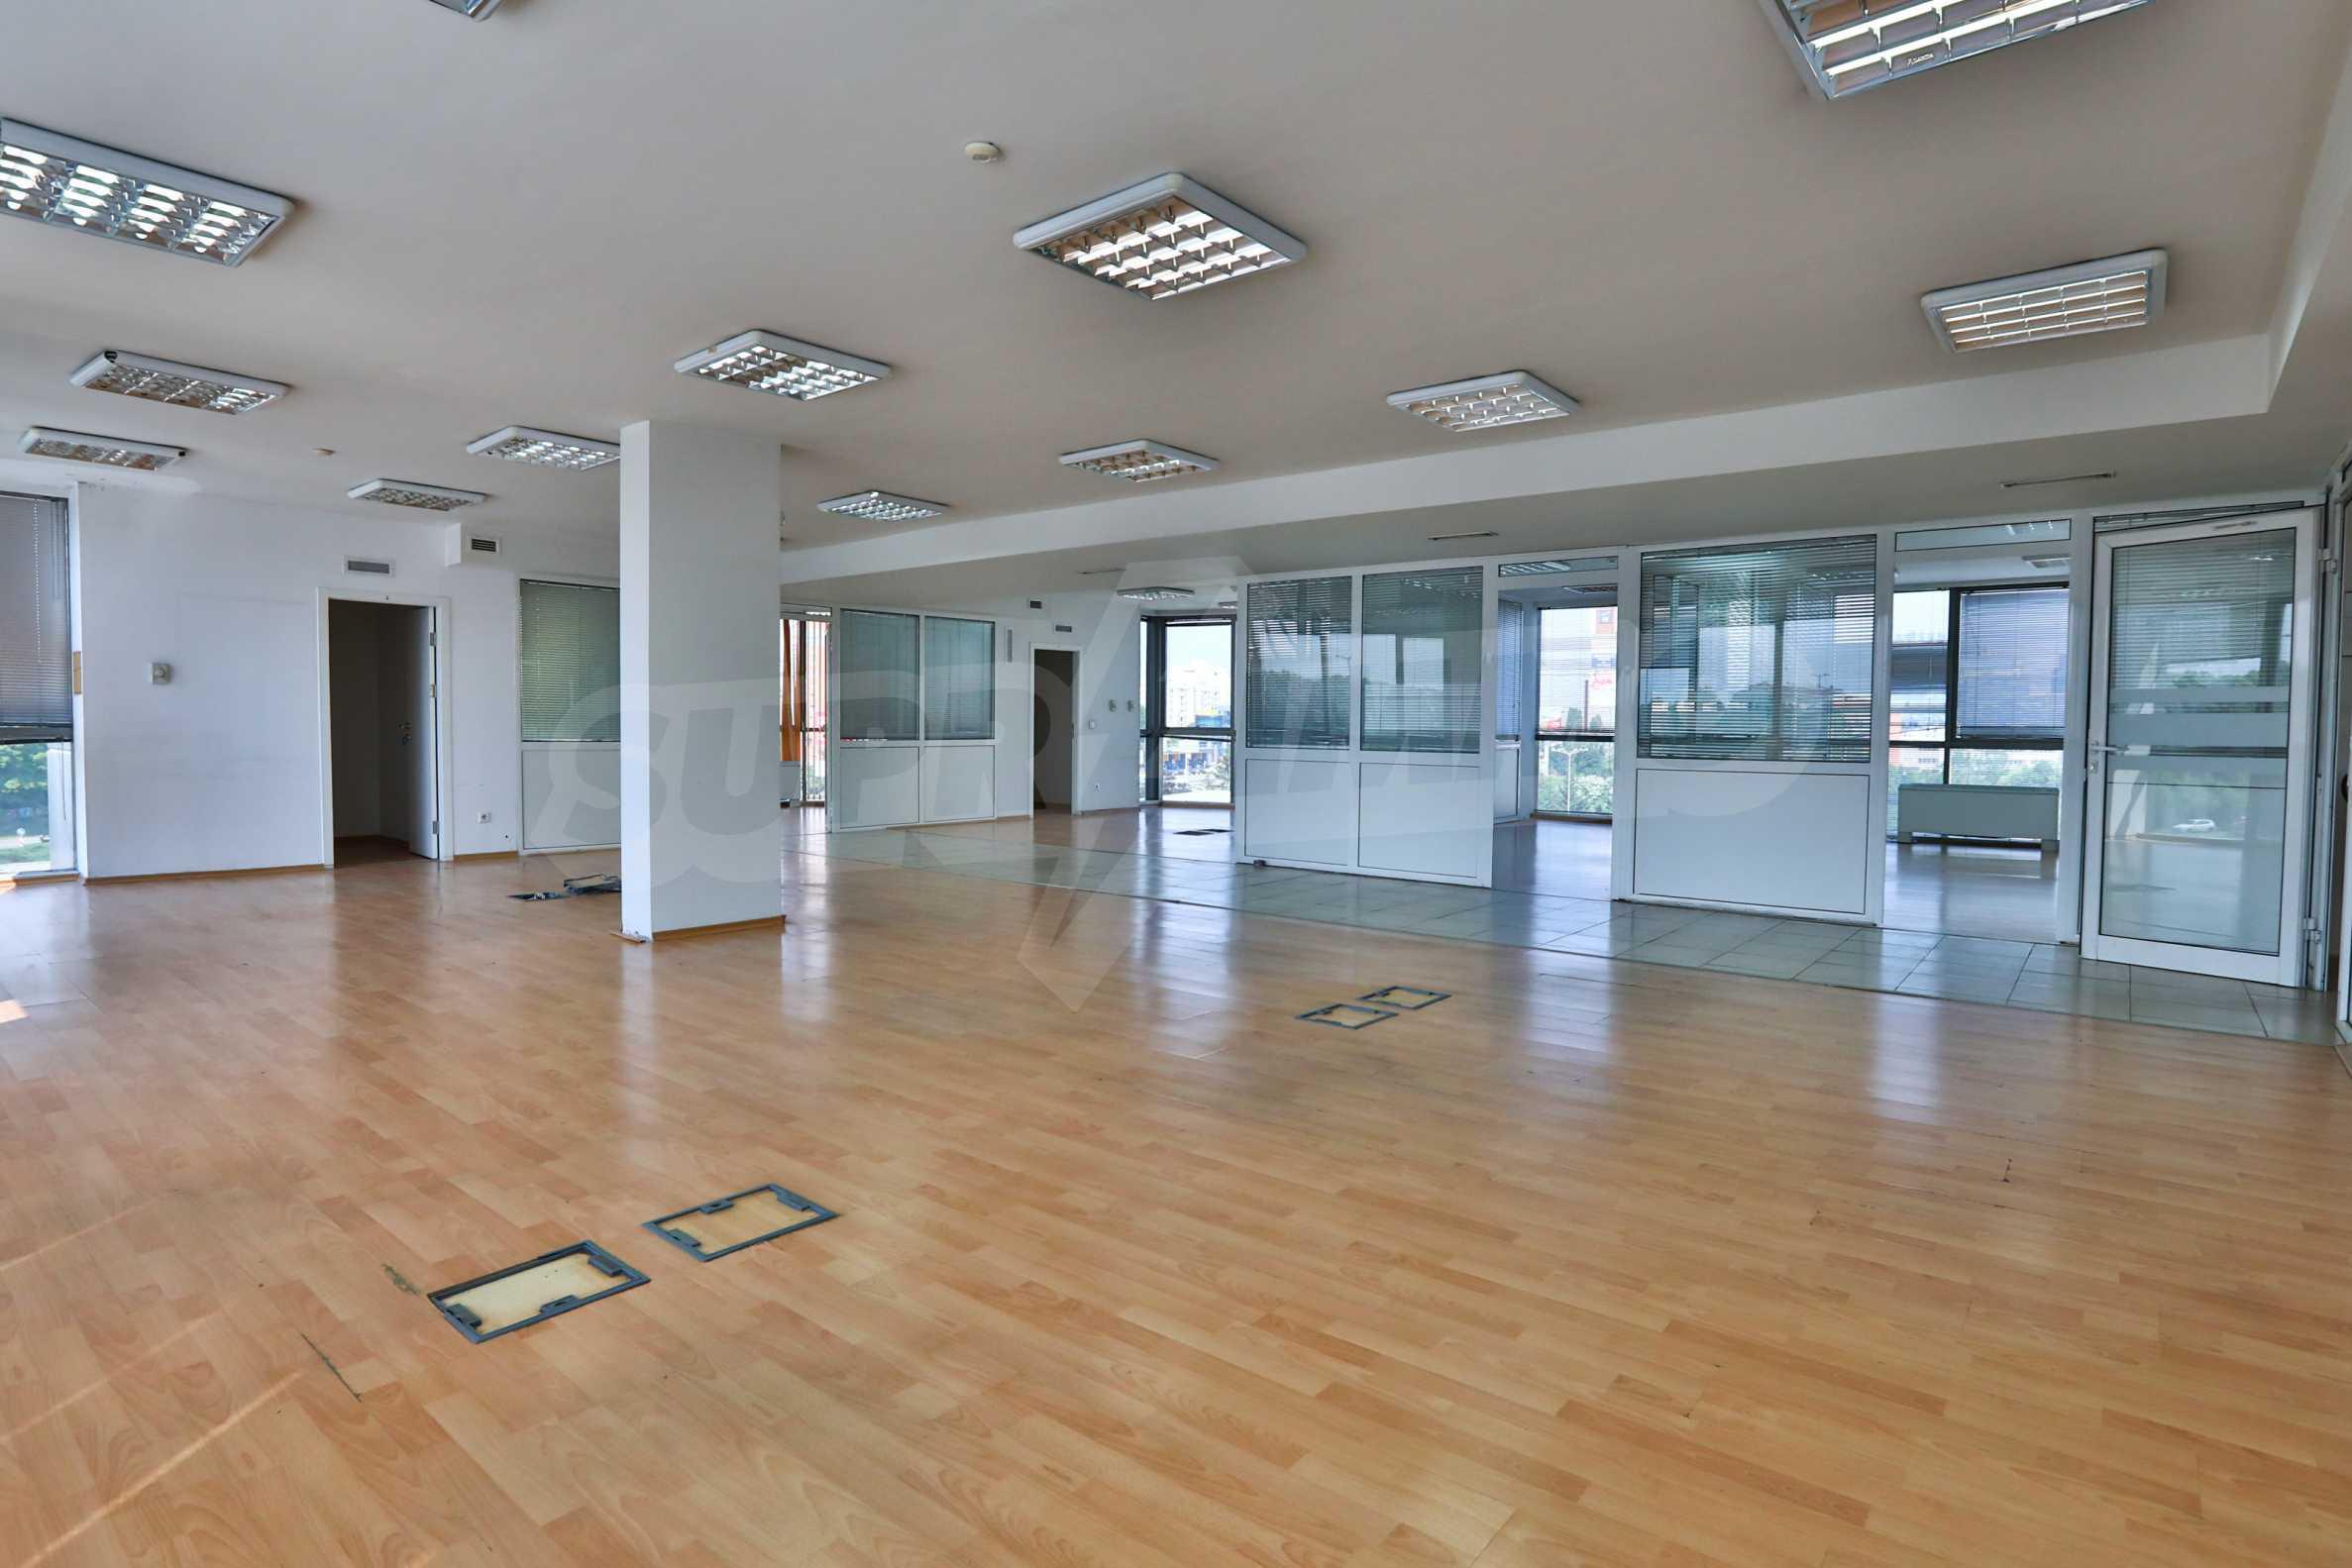 Офис в бизнес сграда висок клас на бул. Цариградско шосе 24